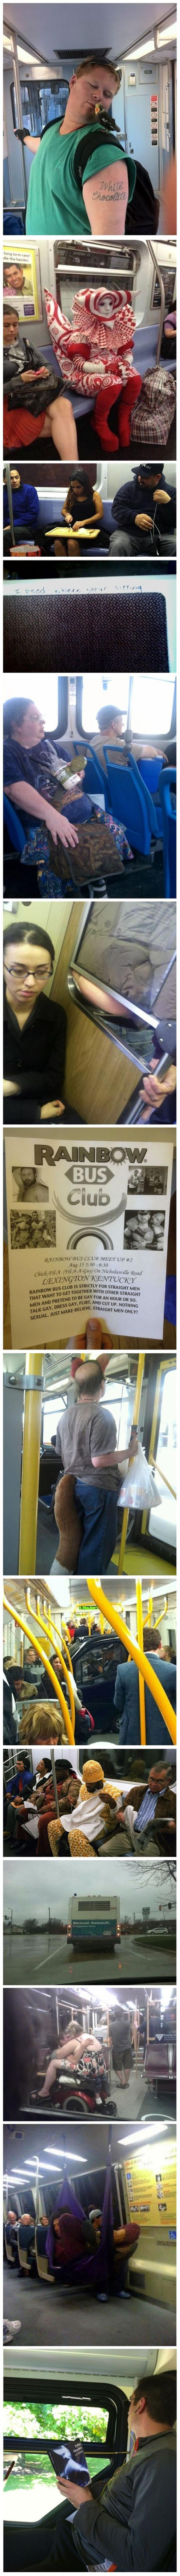 14 Reasons To Avoid Public Transport